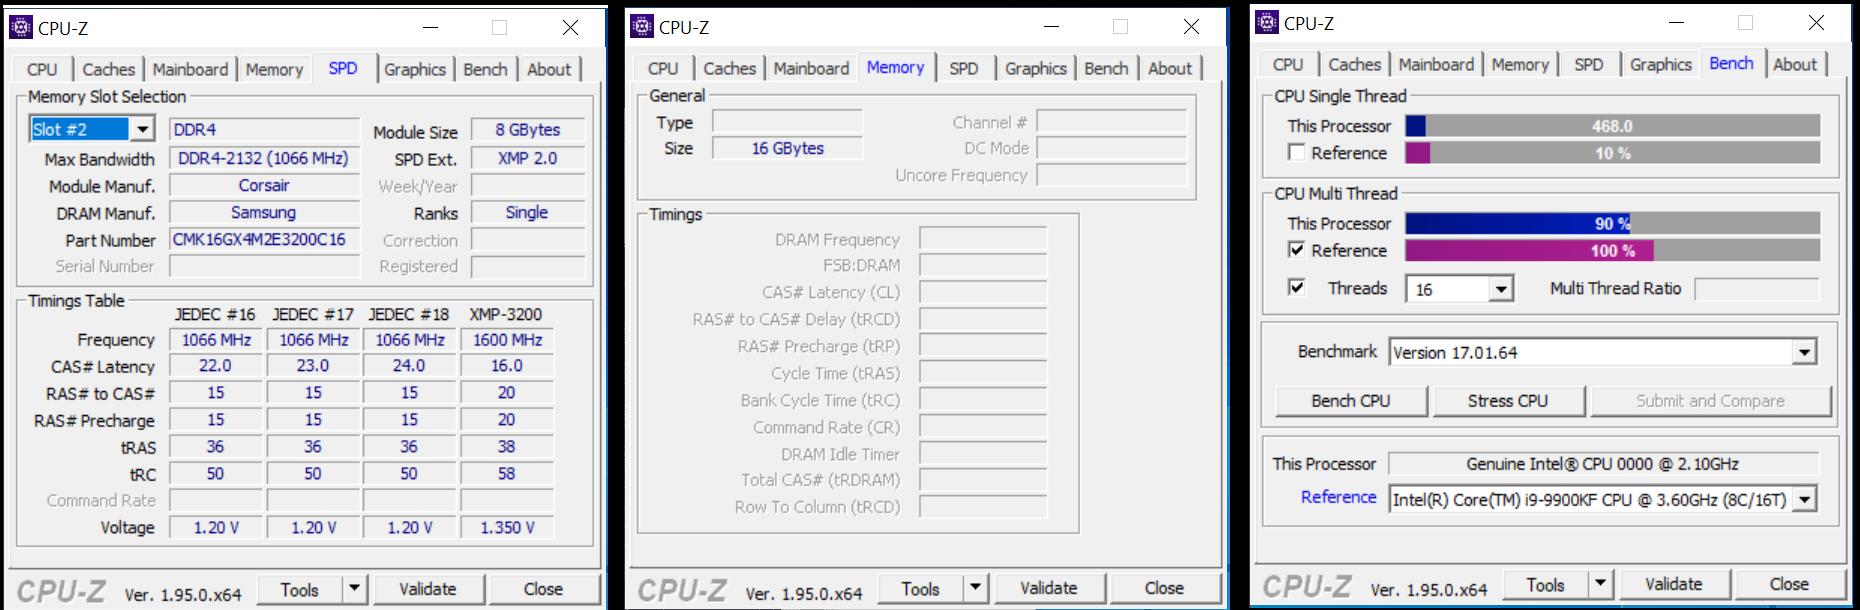 Nombre:  GPU-Z.png Visitas: 149 Tamaño: 296.4 KB